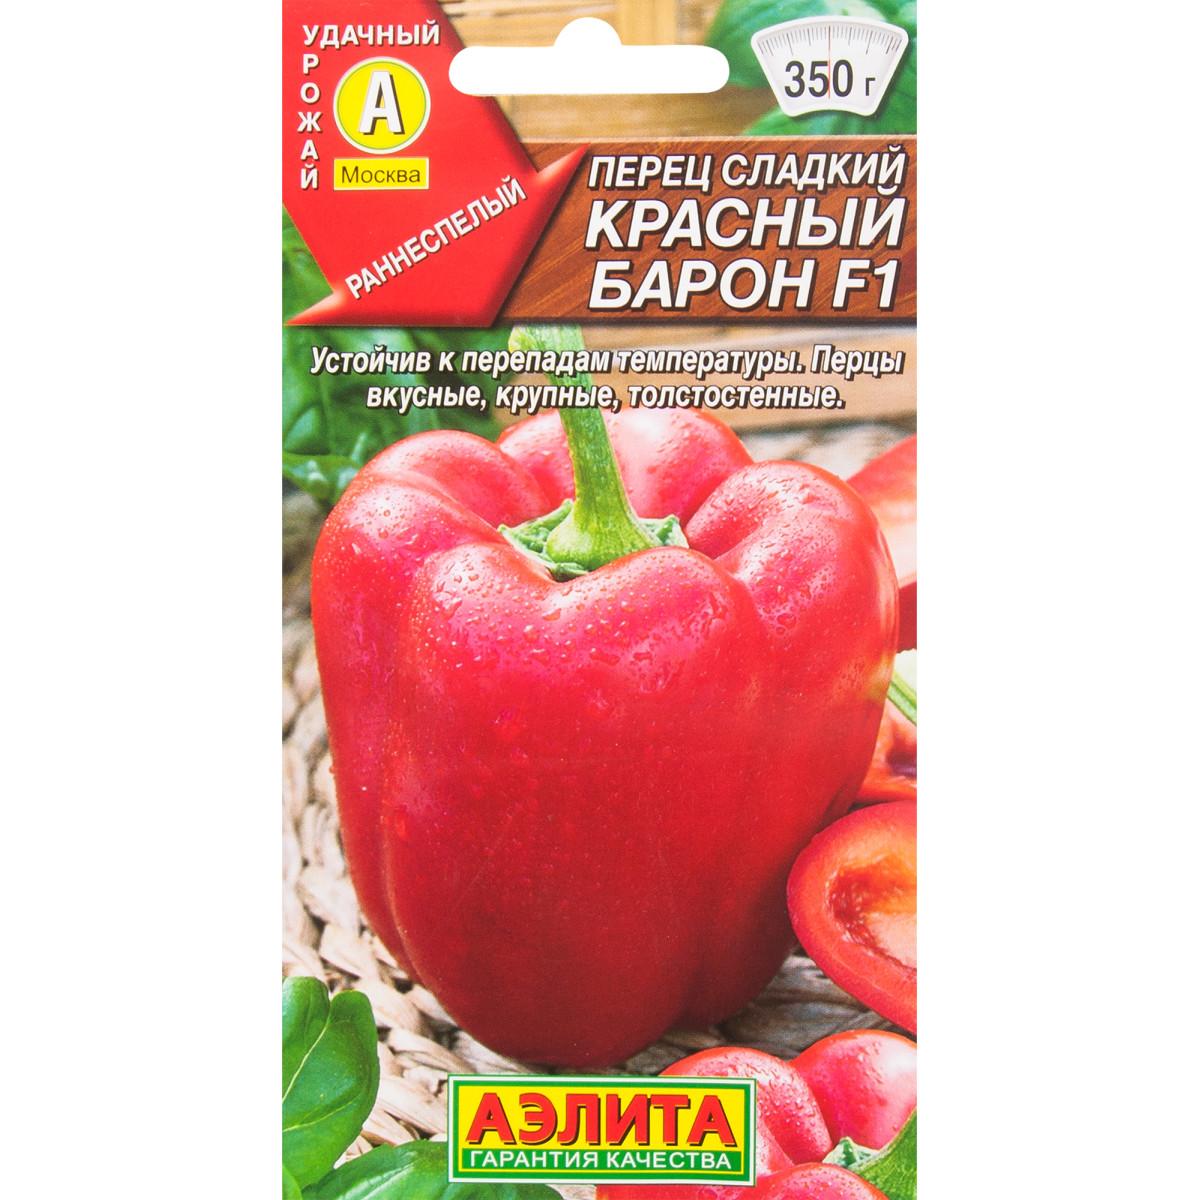 Семена Перец сладкий Красный барон F1 0.1 г